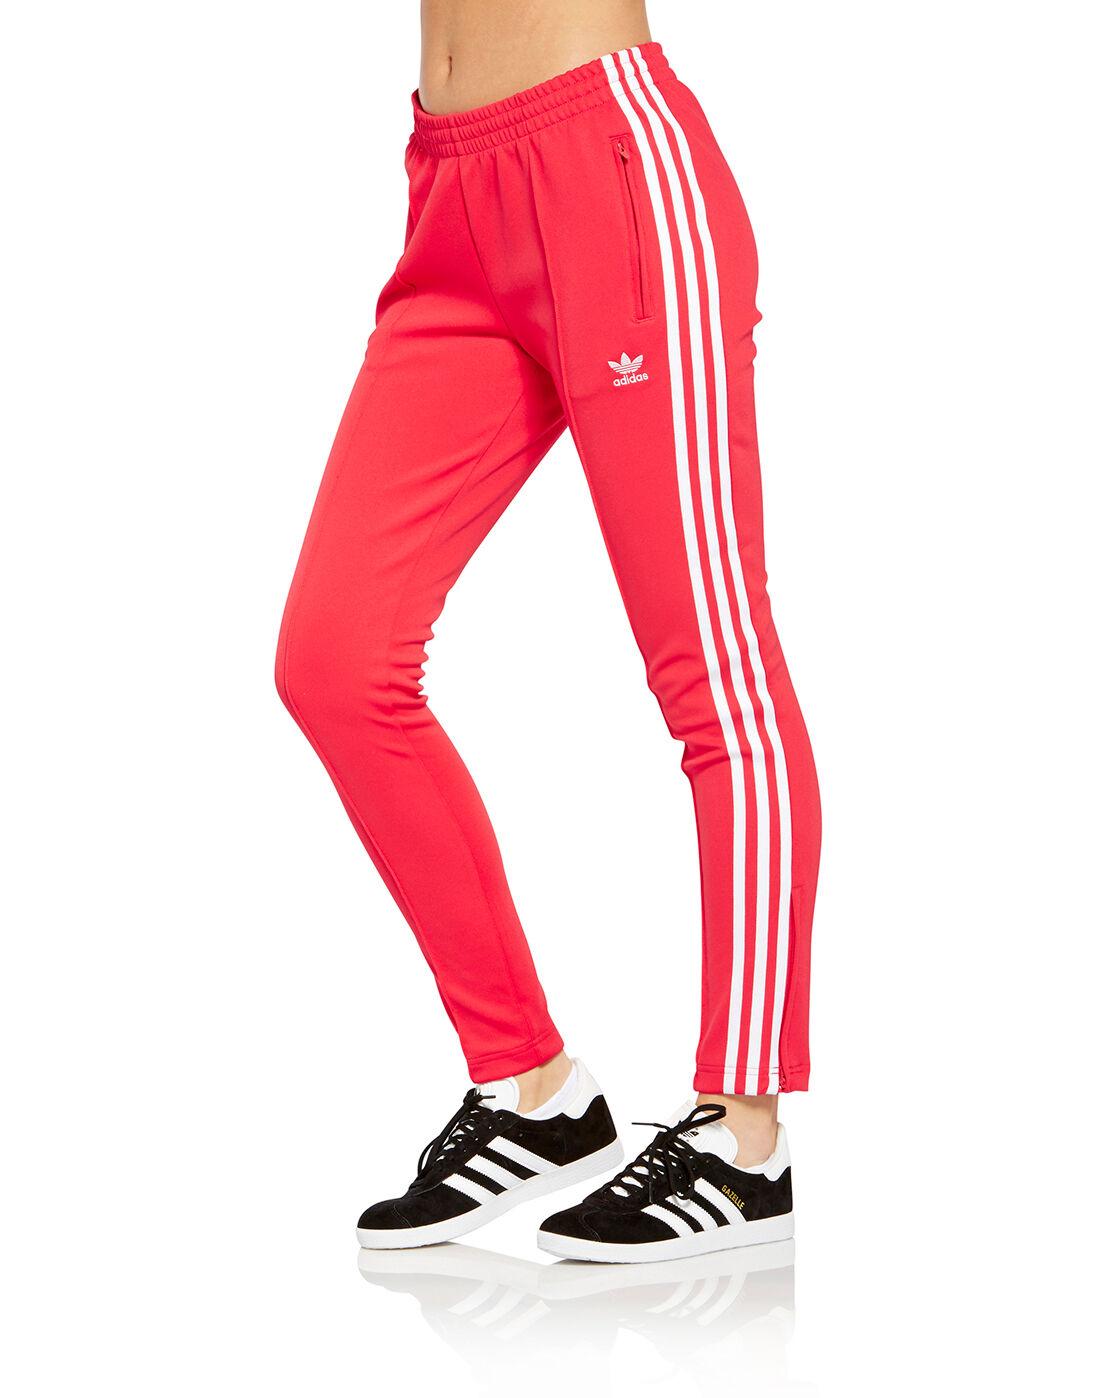 Women's Red adidas Originals Superstar Track pants | Life ...